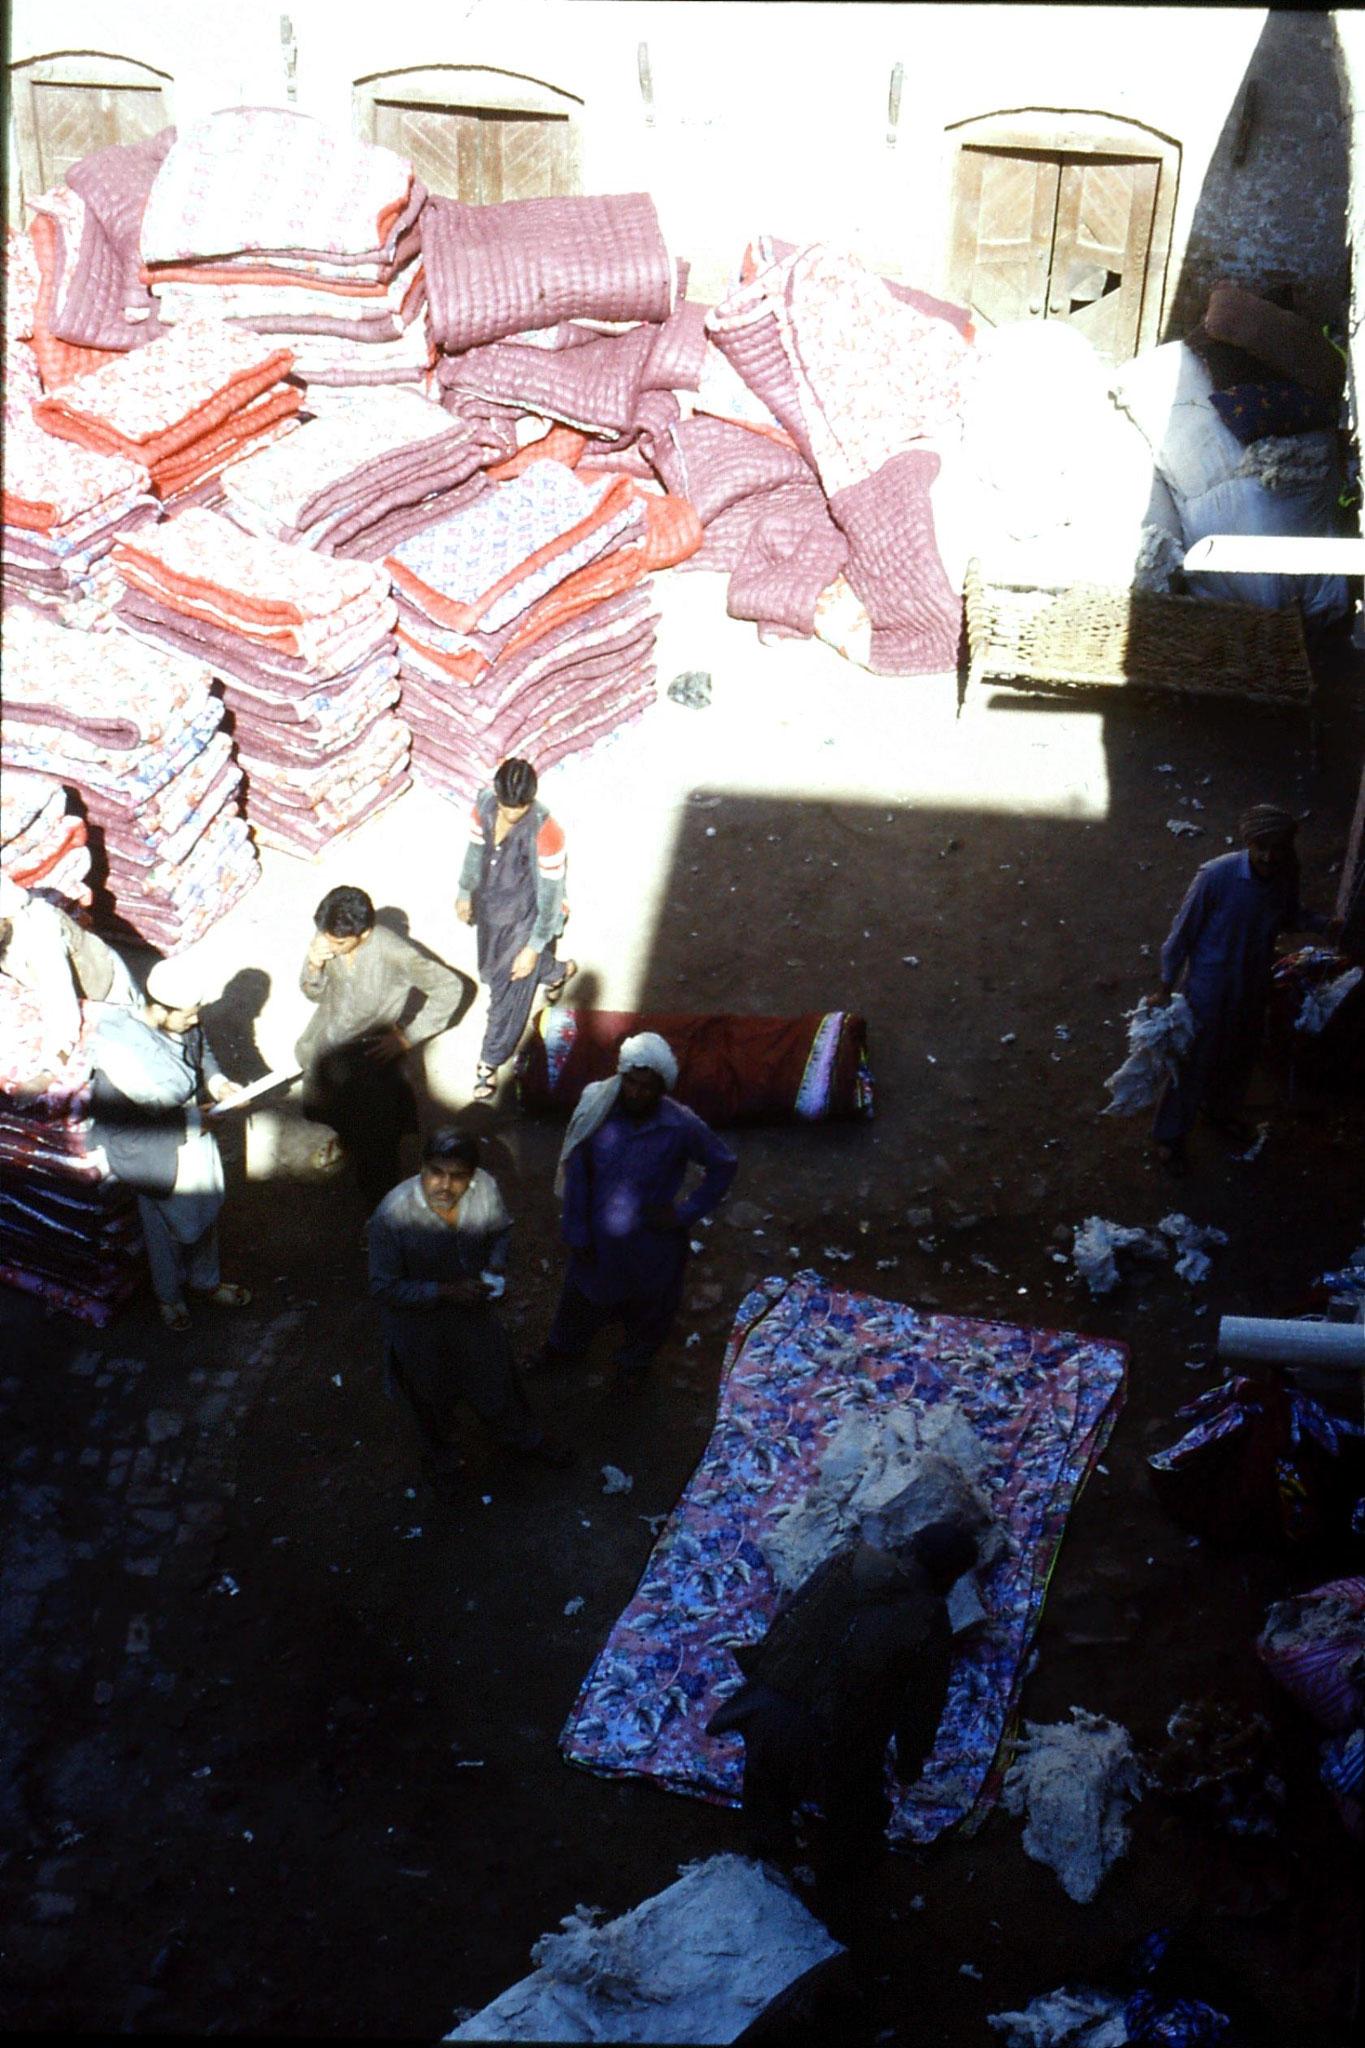 5/11/1989: 12: Peshawar, quilt factory